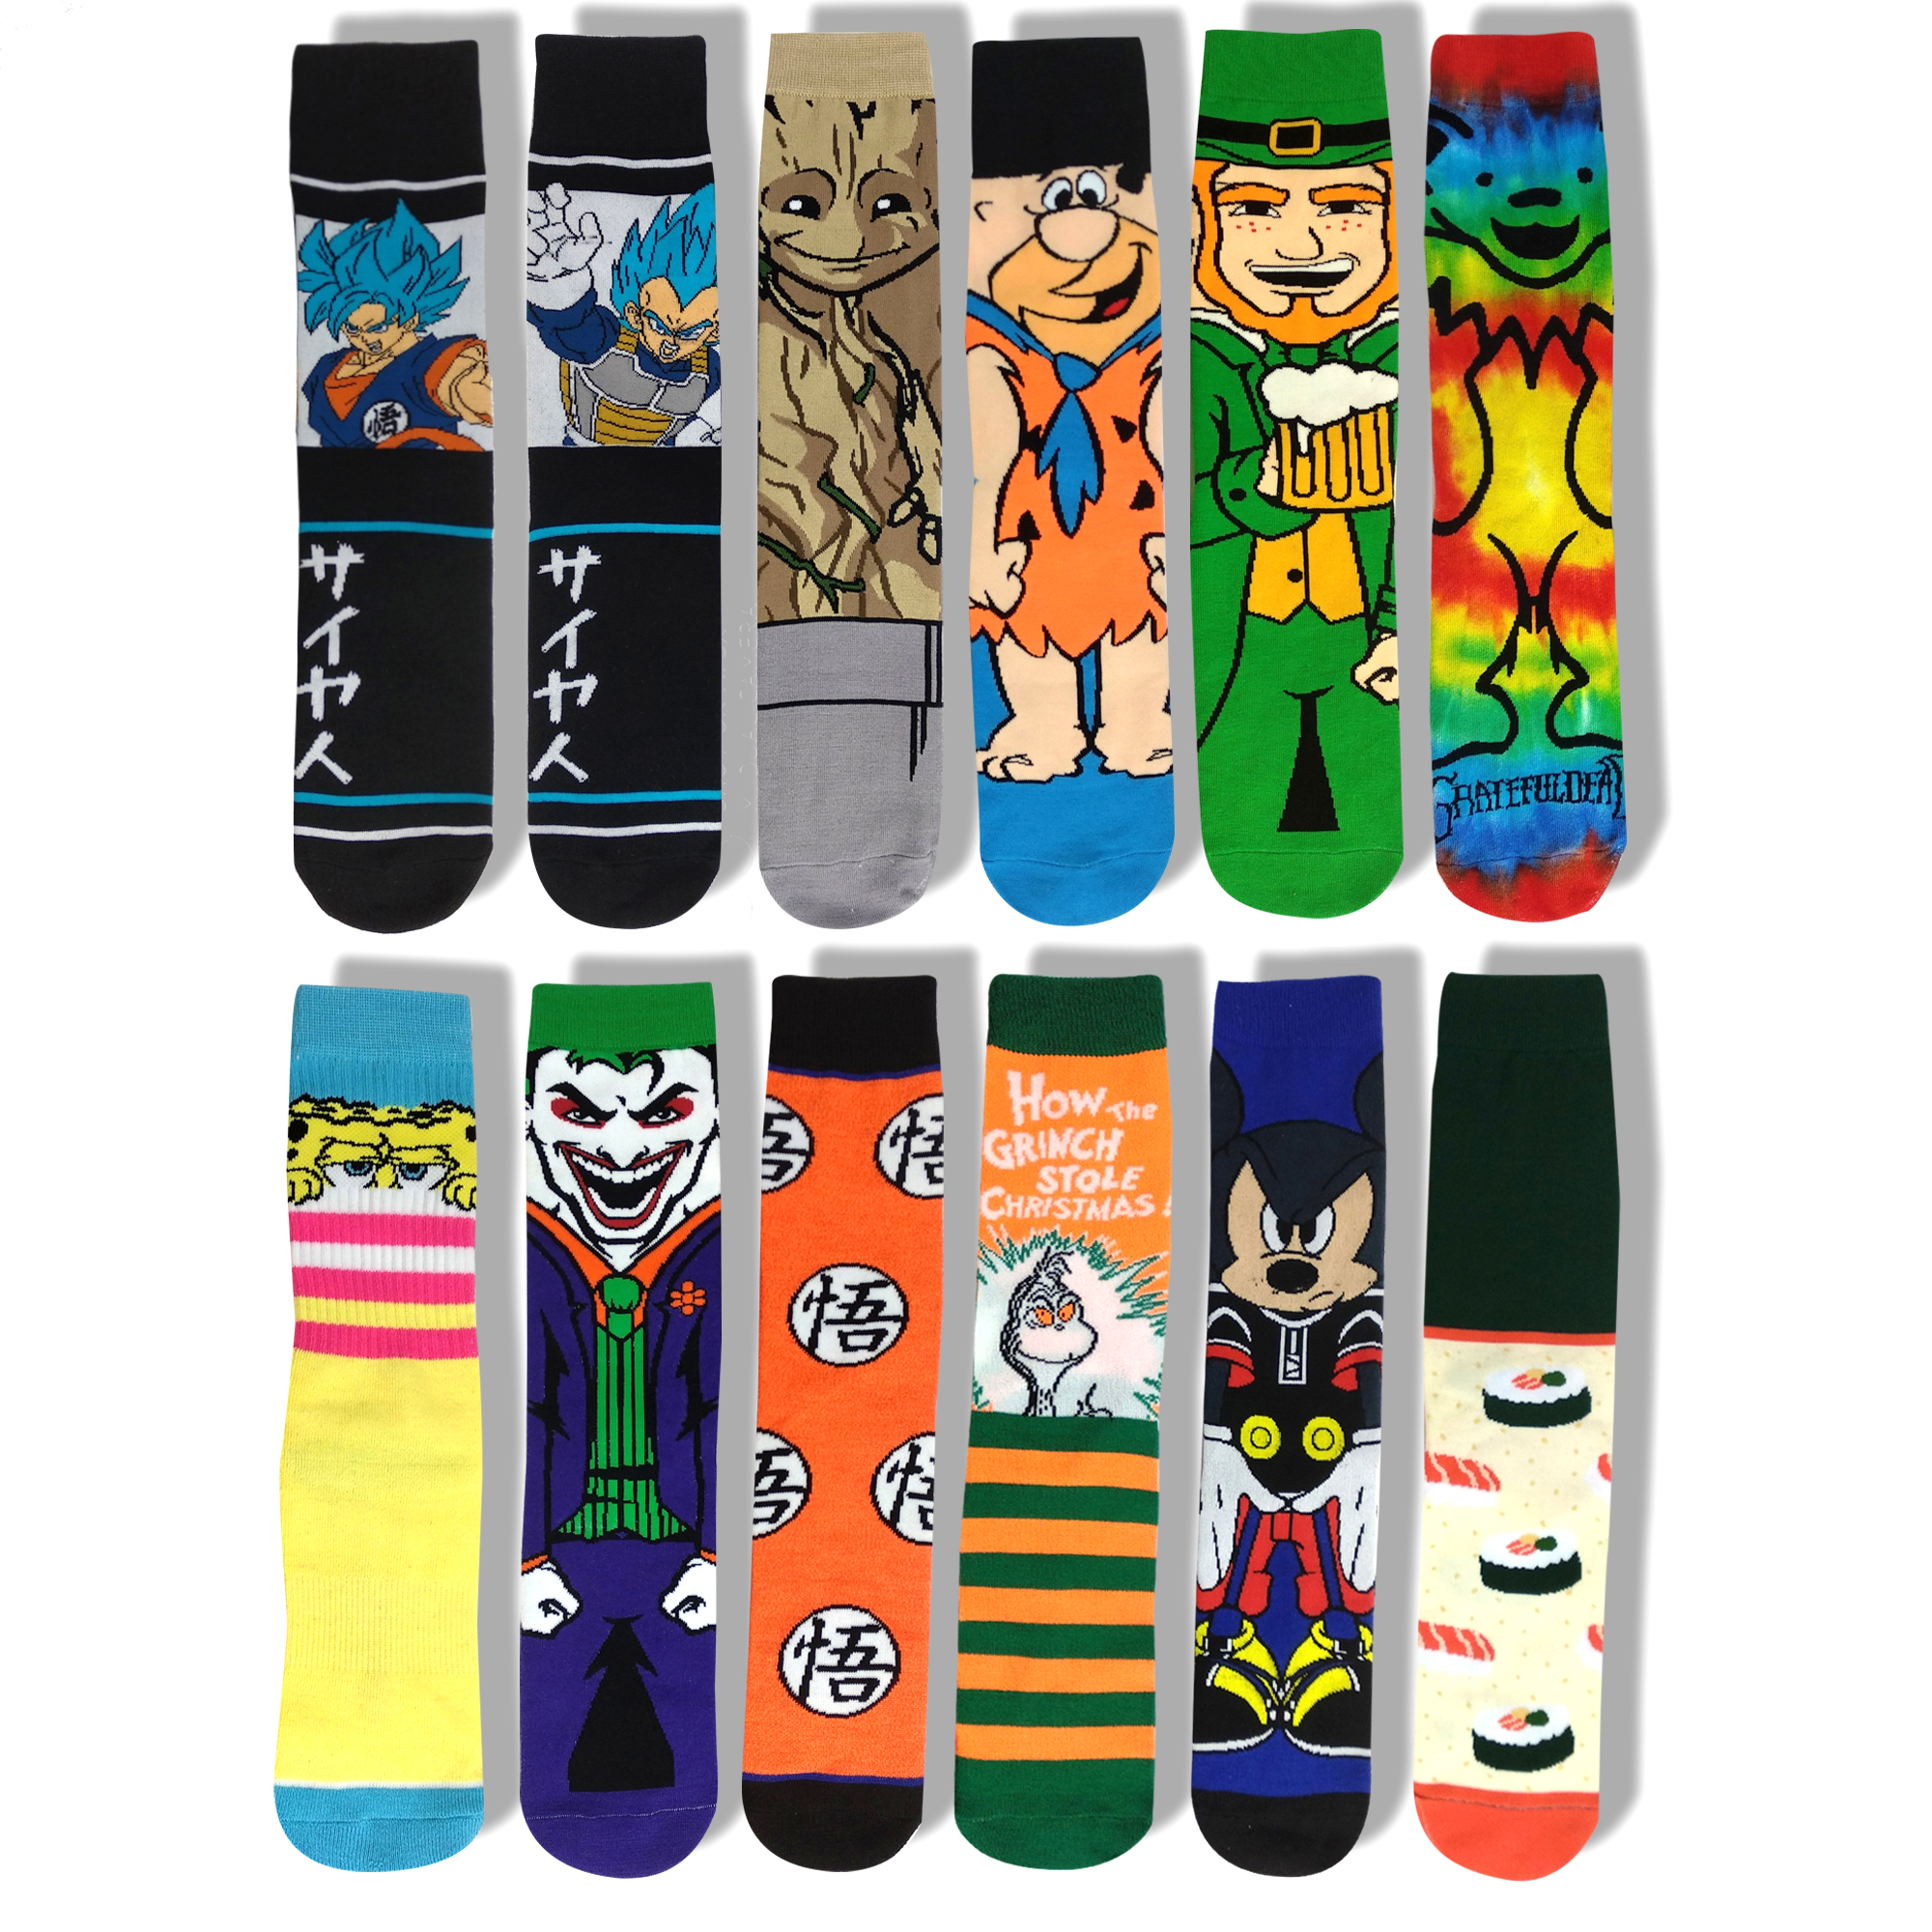 Cartoon Character Socks Joker Grinch Cosplay Personalized Novelty Dragon Ball Socks Casual Cute Colorful Women Skateboard Socks